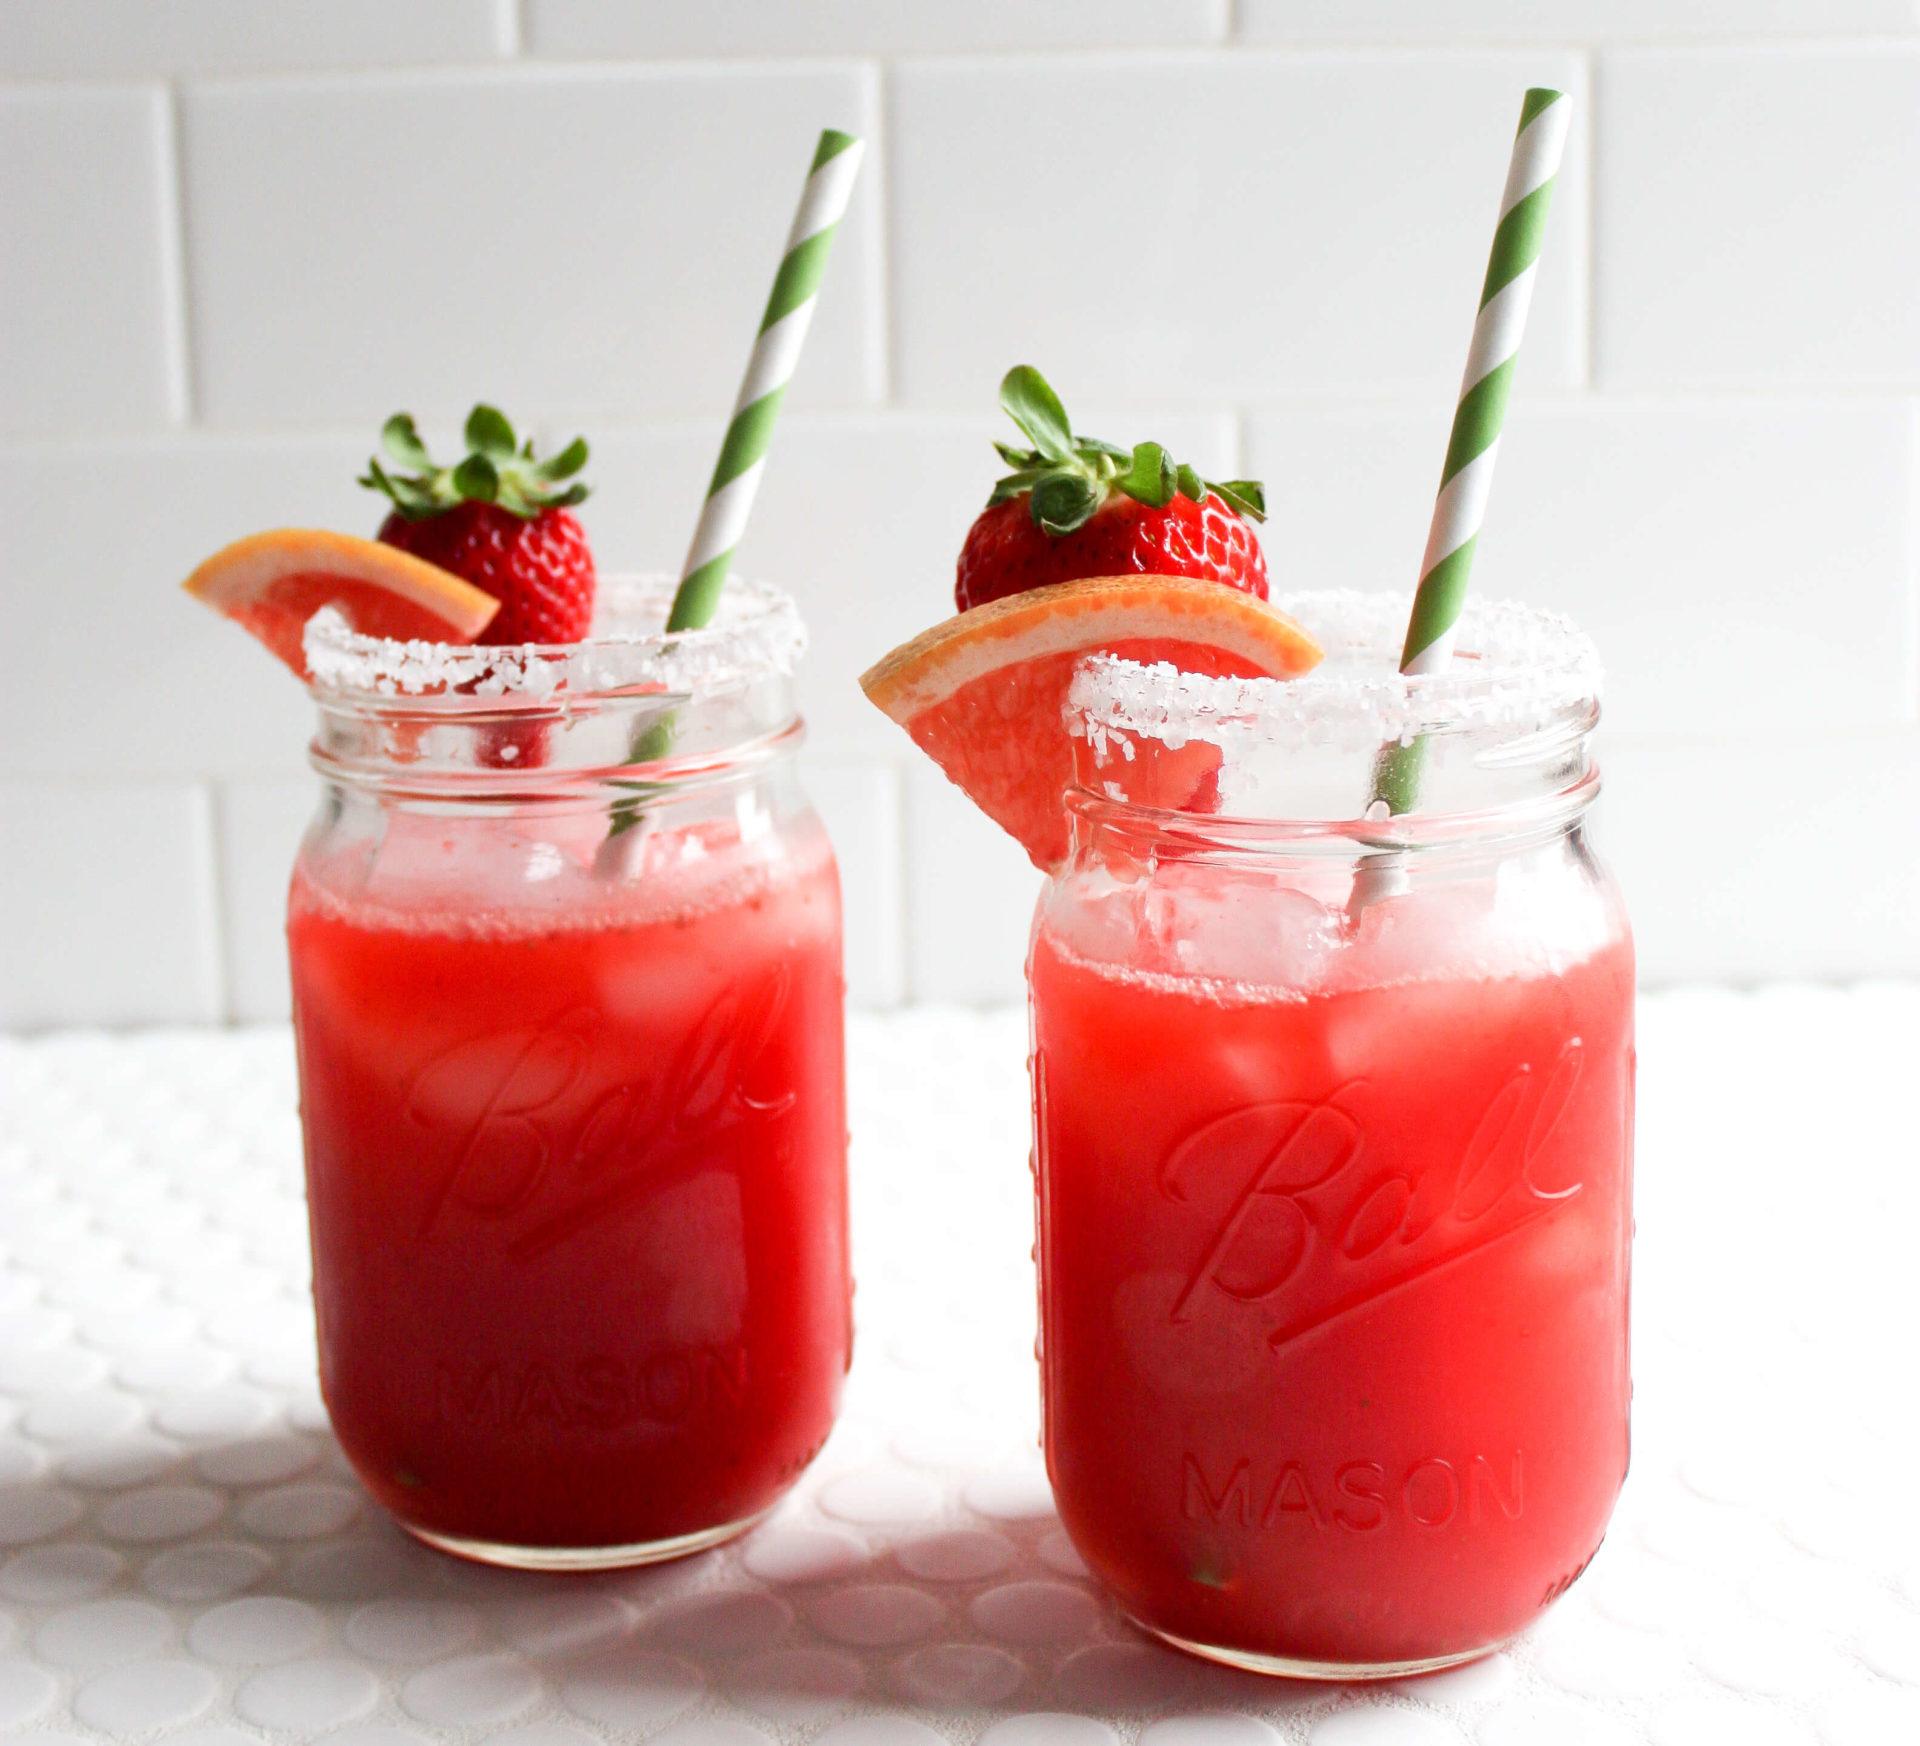 Strawberry Grapefruit Margaritas